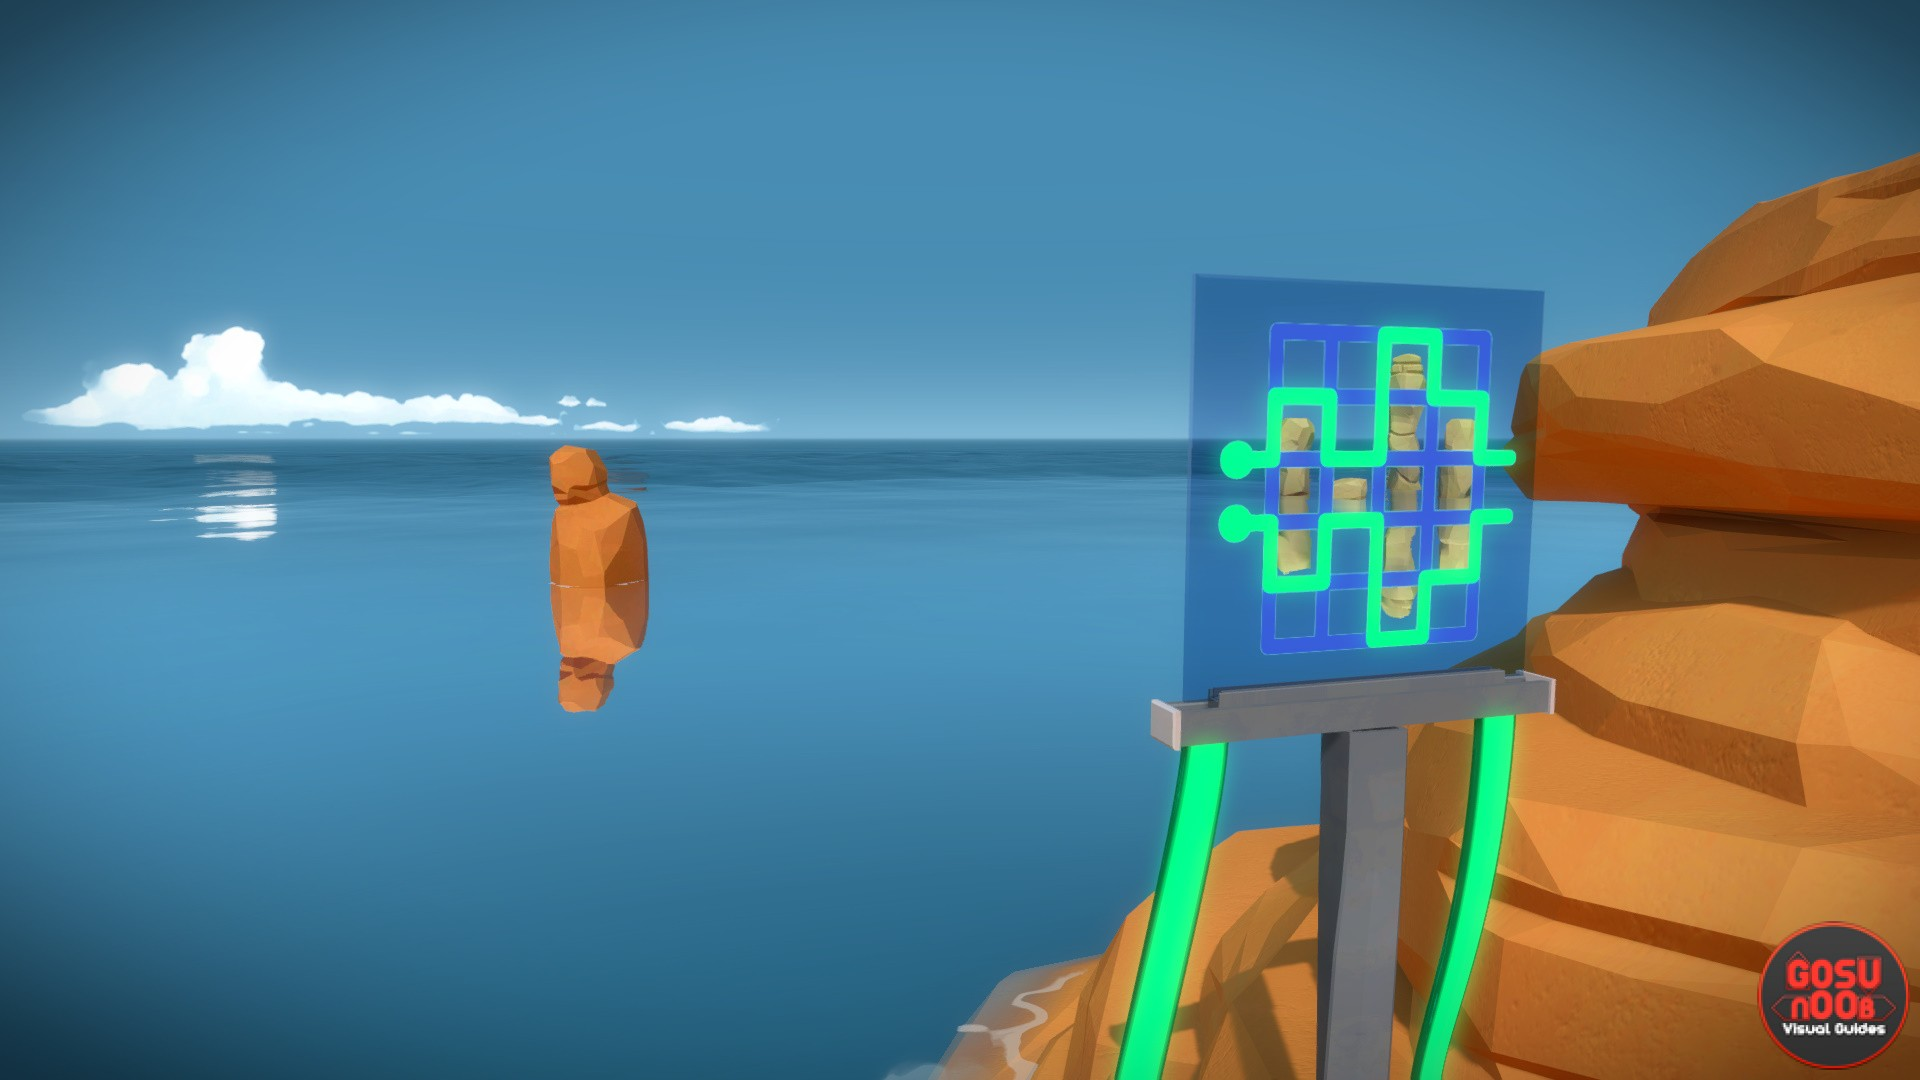 Symmetry Perceptual Puzzle 3 Solution The Witness Gosu